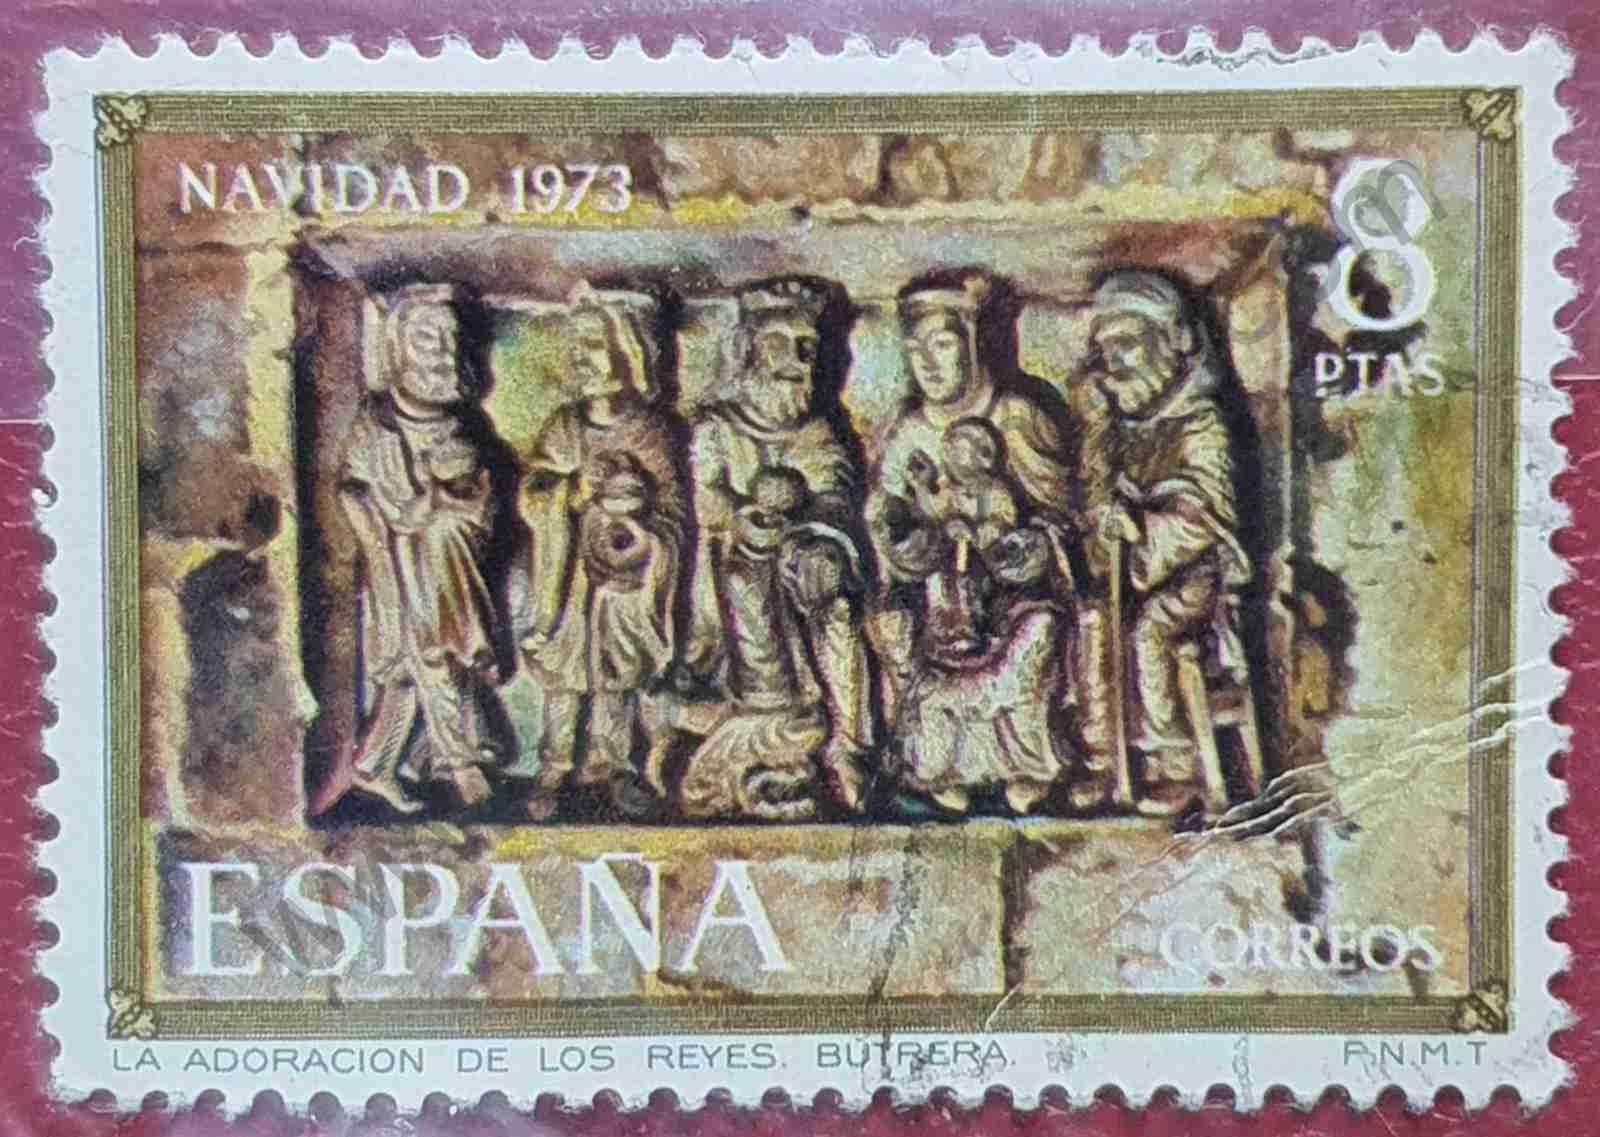 Adoración de los reyes - sello España 1973